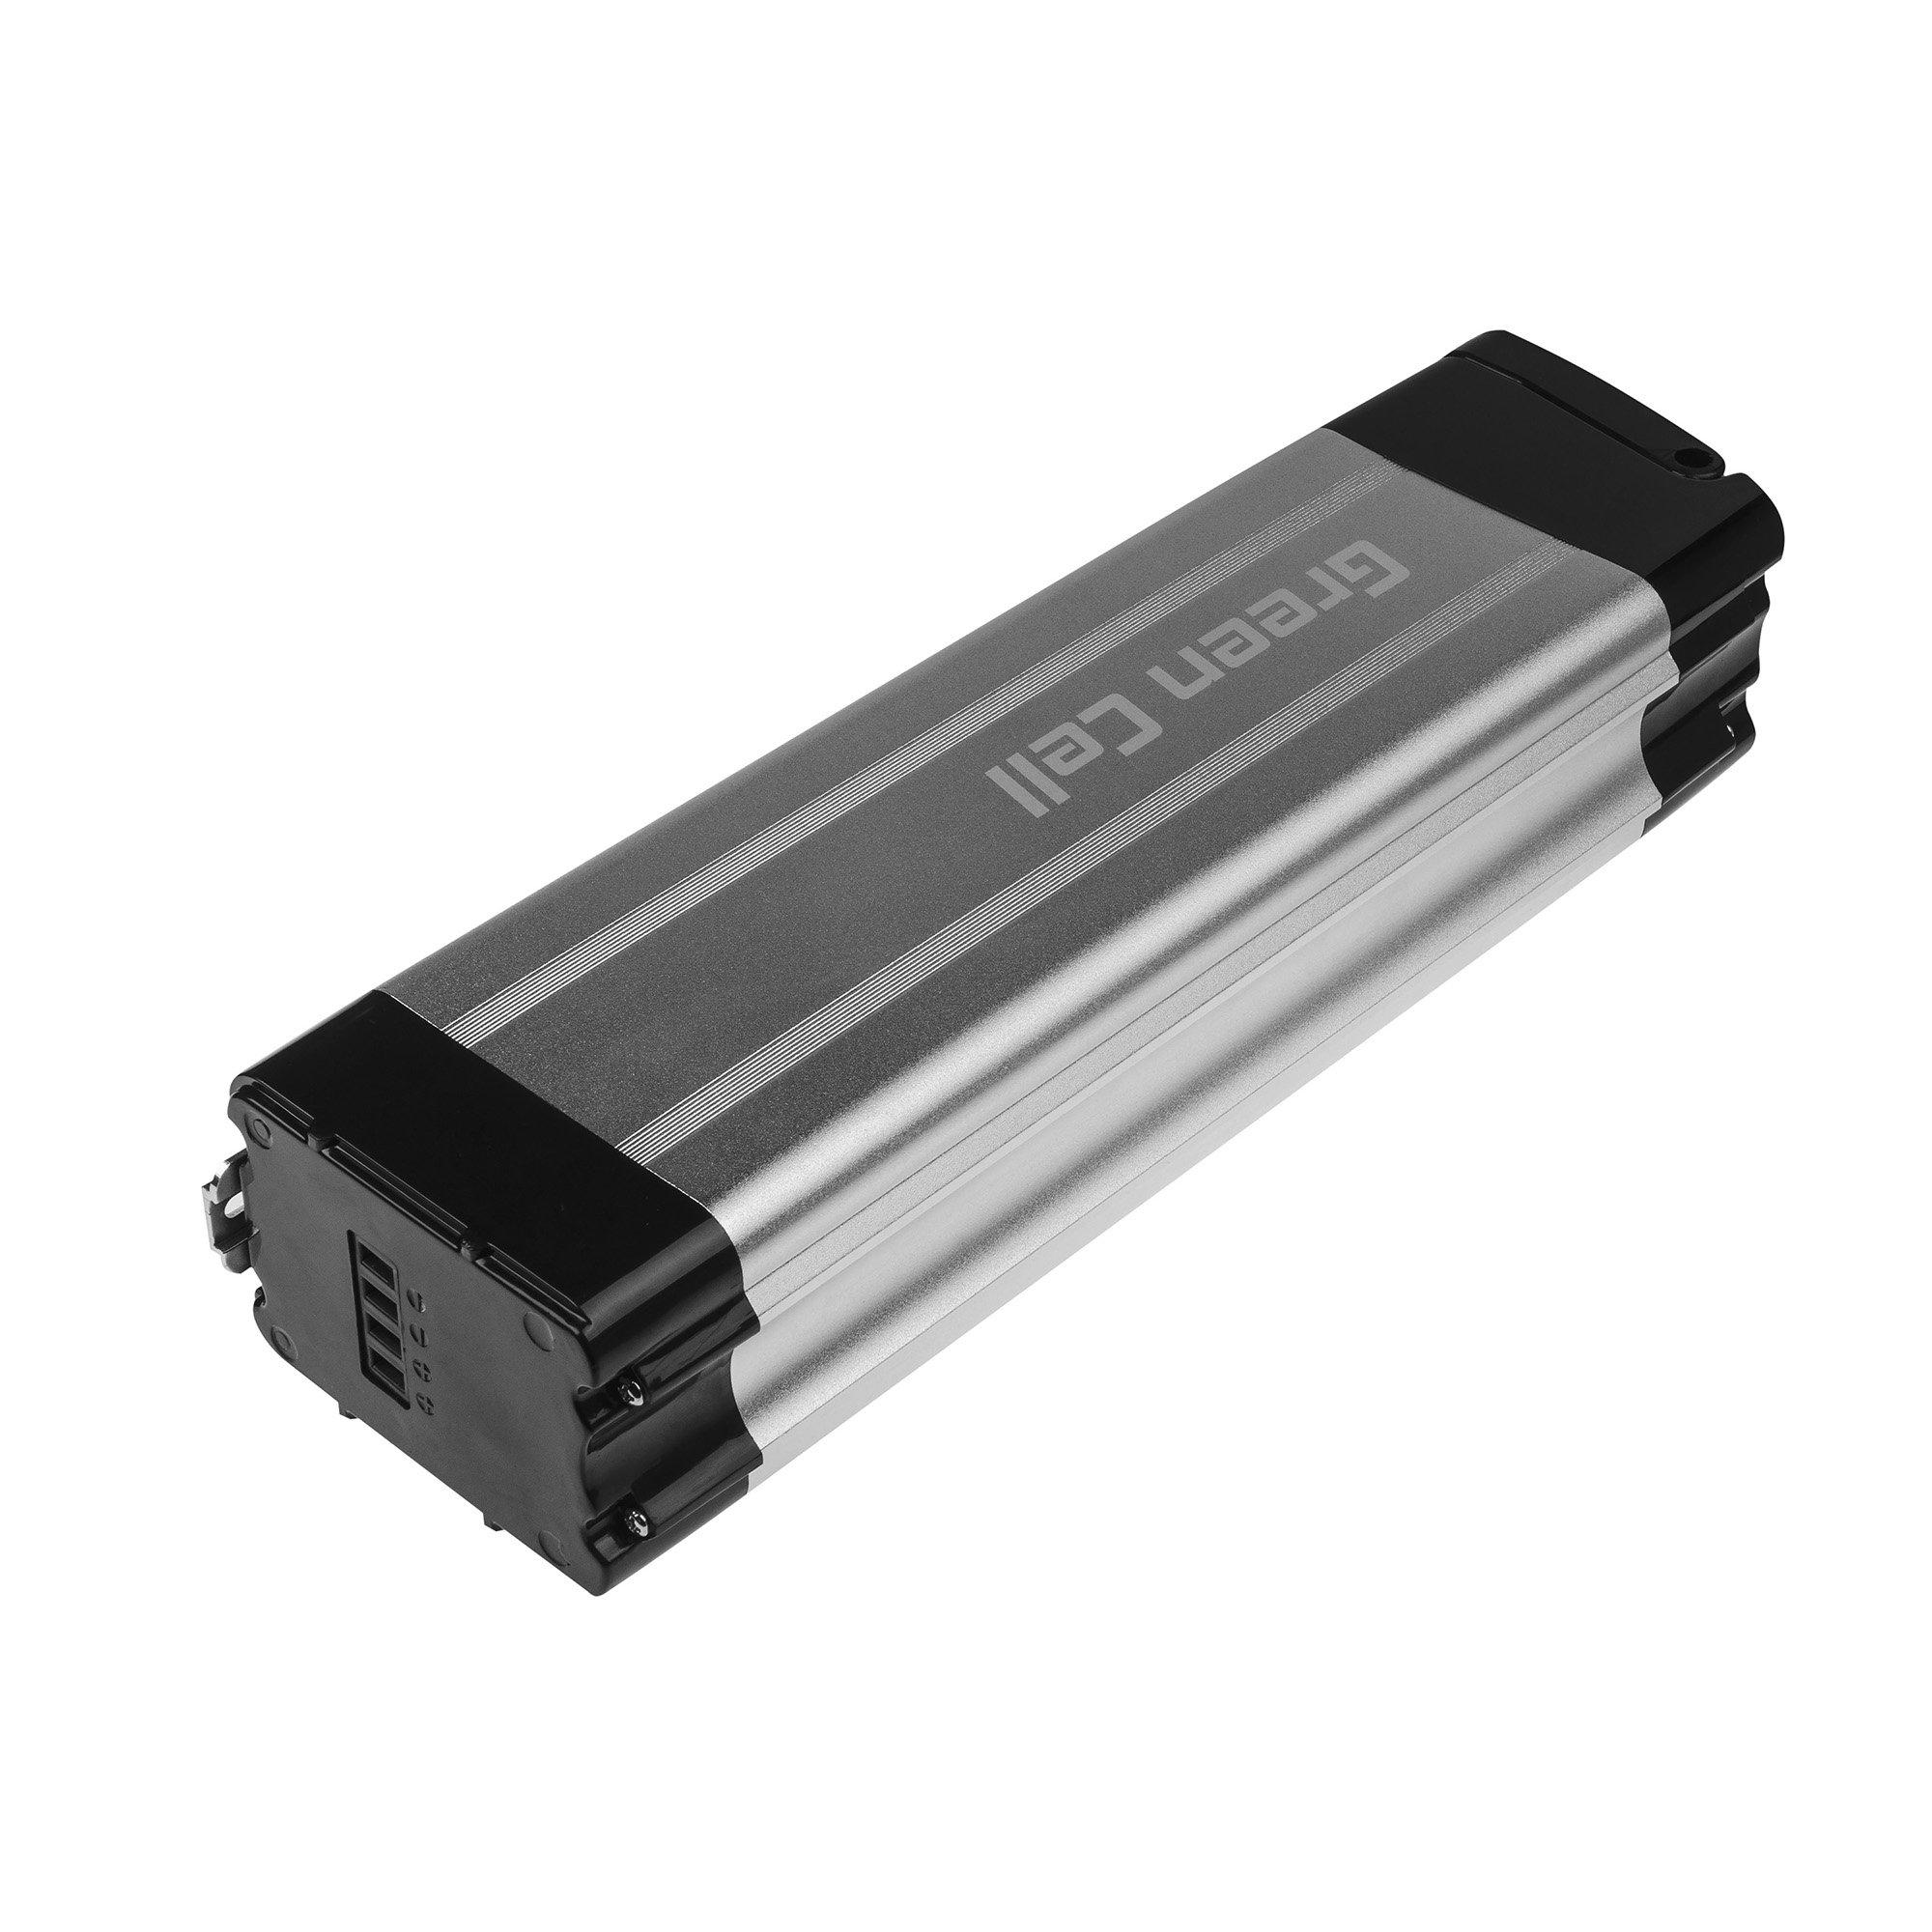 Battery Green Cell Silverfish 48V 14.5Ah 696Wh for E-Bike Pedelec